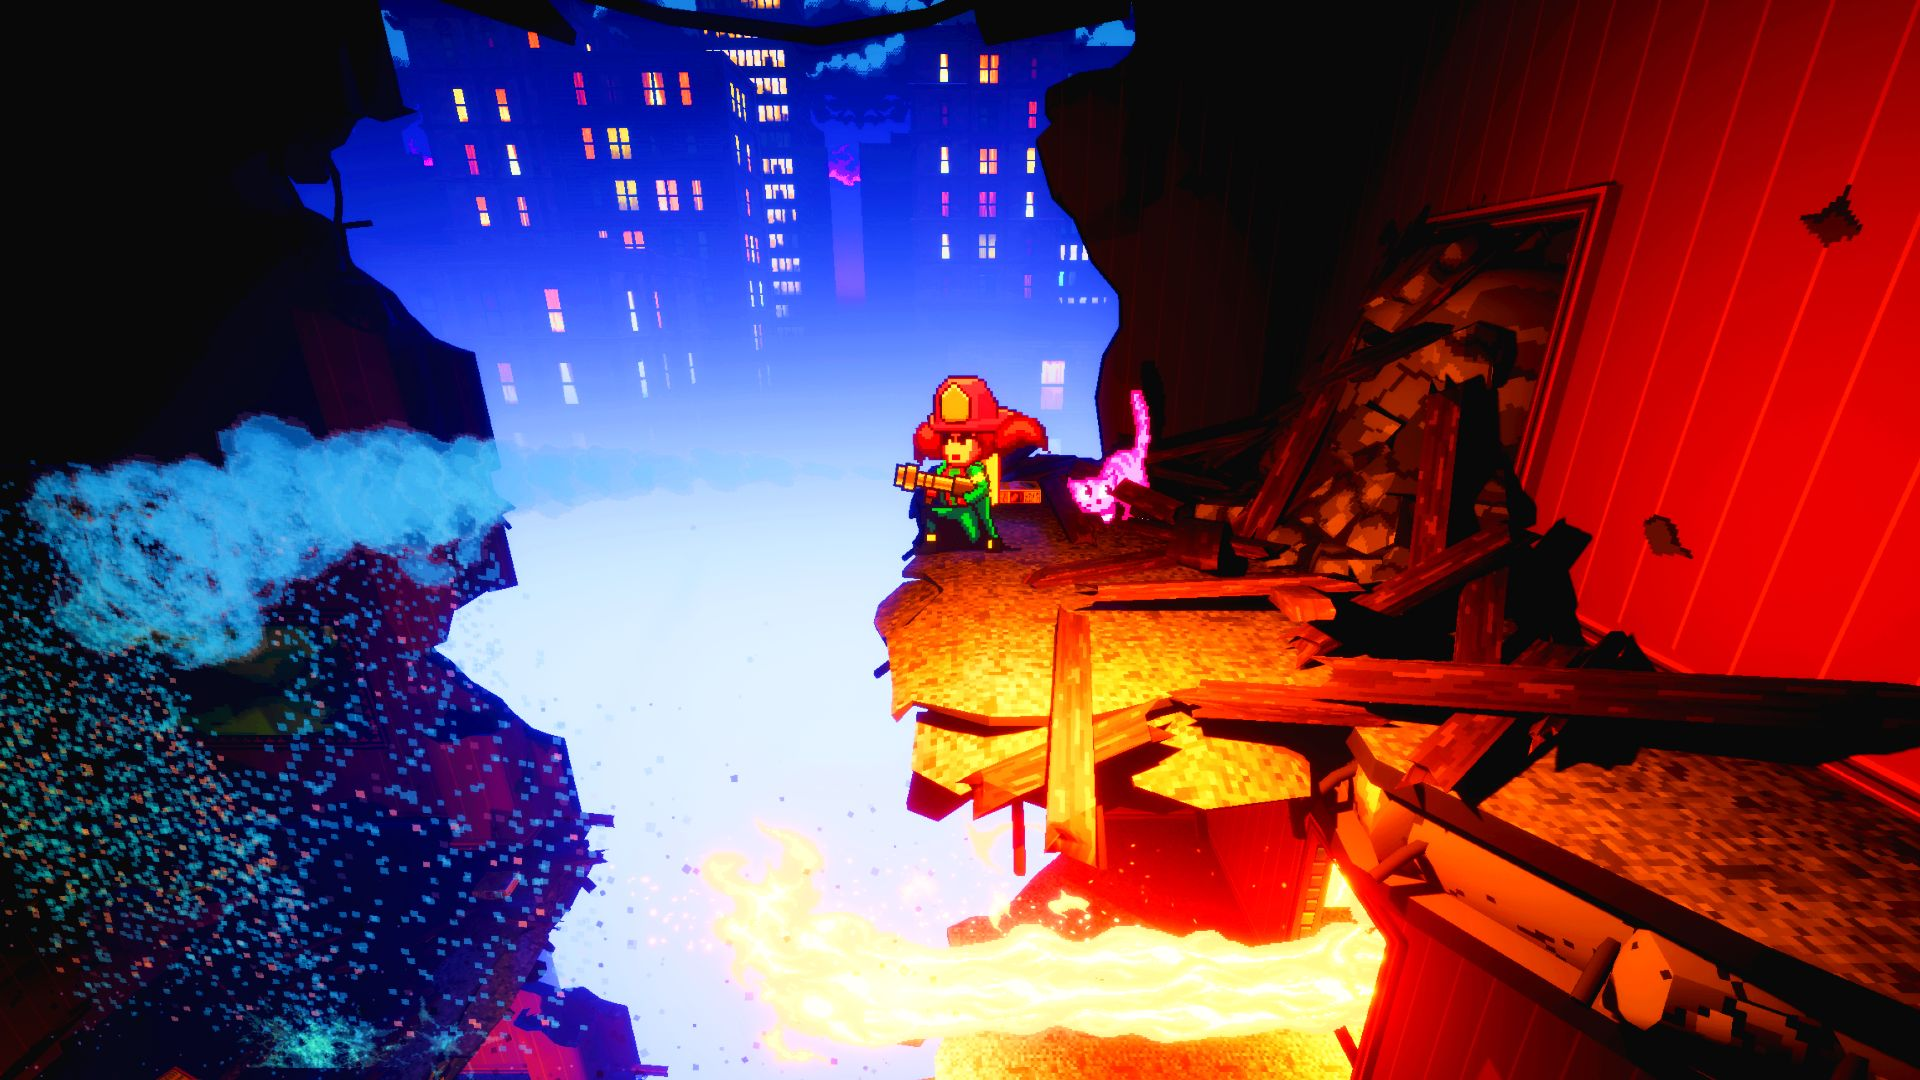 Making it in Unreal: battling raging infernos in roguelite Firegirl